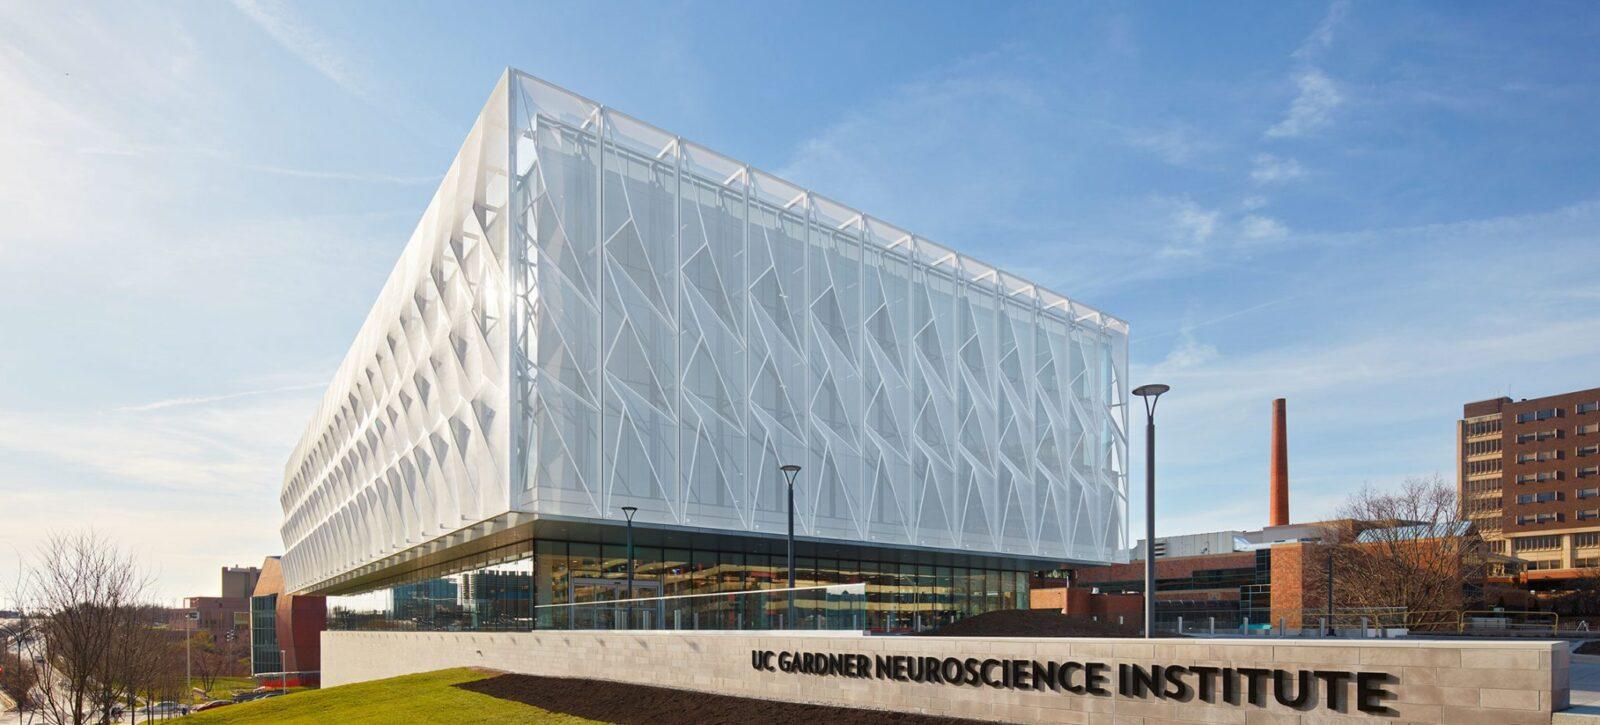 UC Gardner Neuroscience Institute